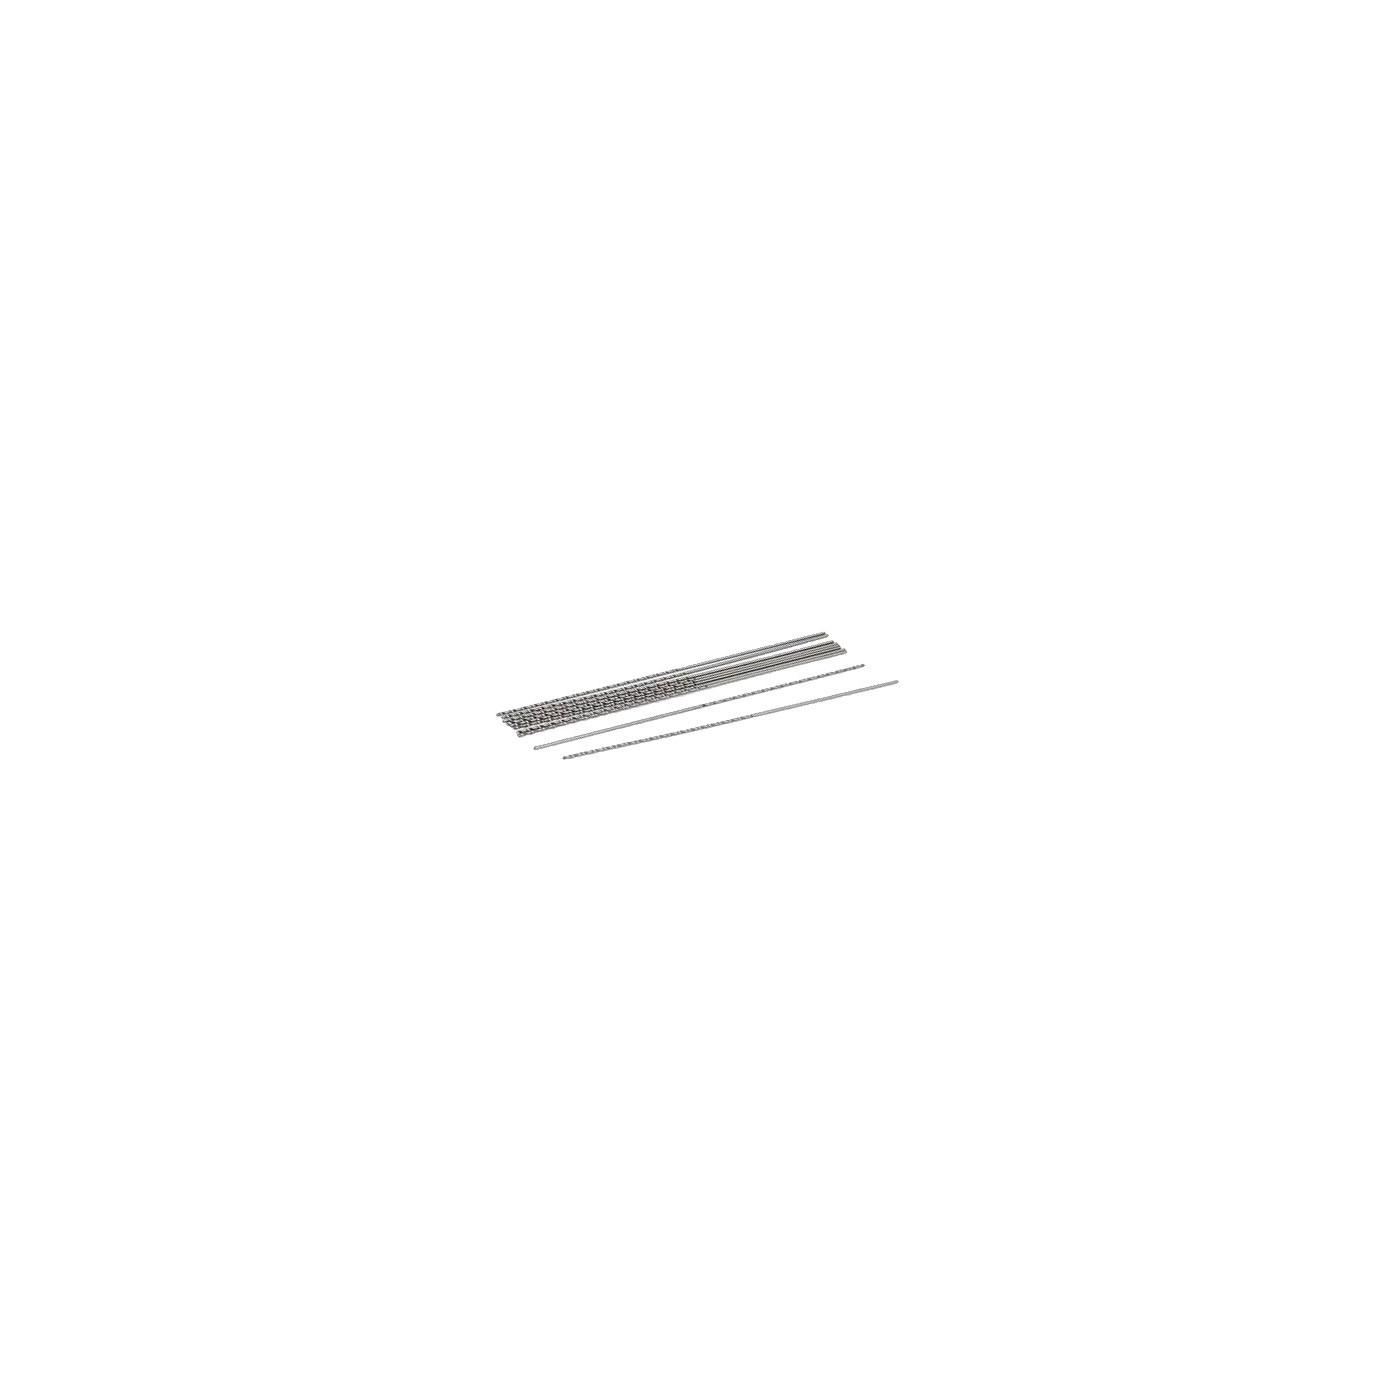 Set of 10 extra long, super thin drill bits (0.8x100 mm, HSS)  - 1